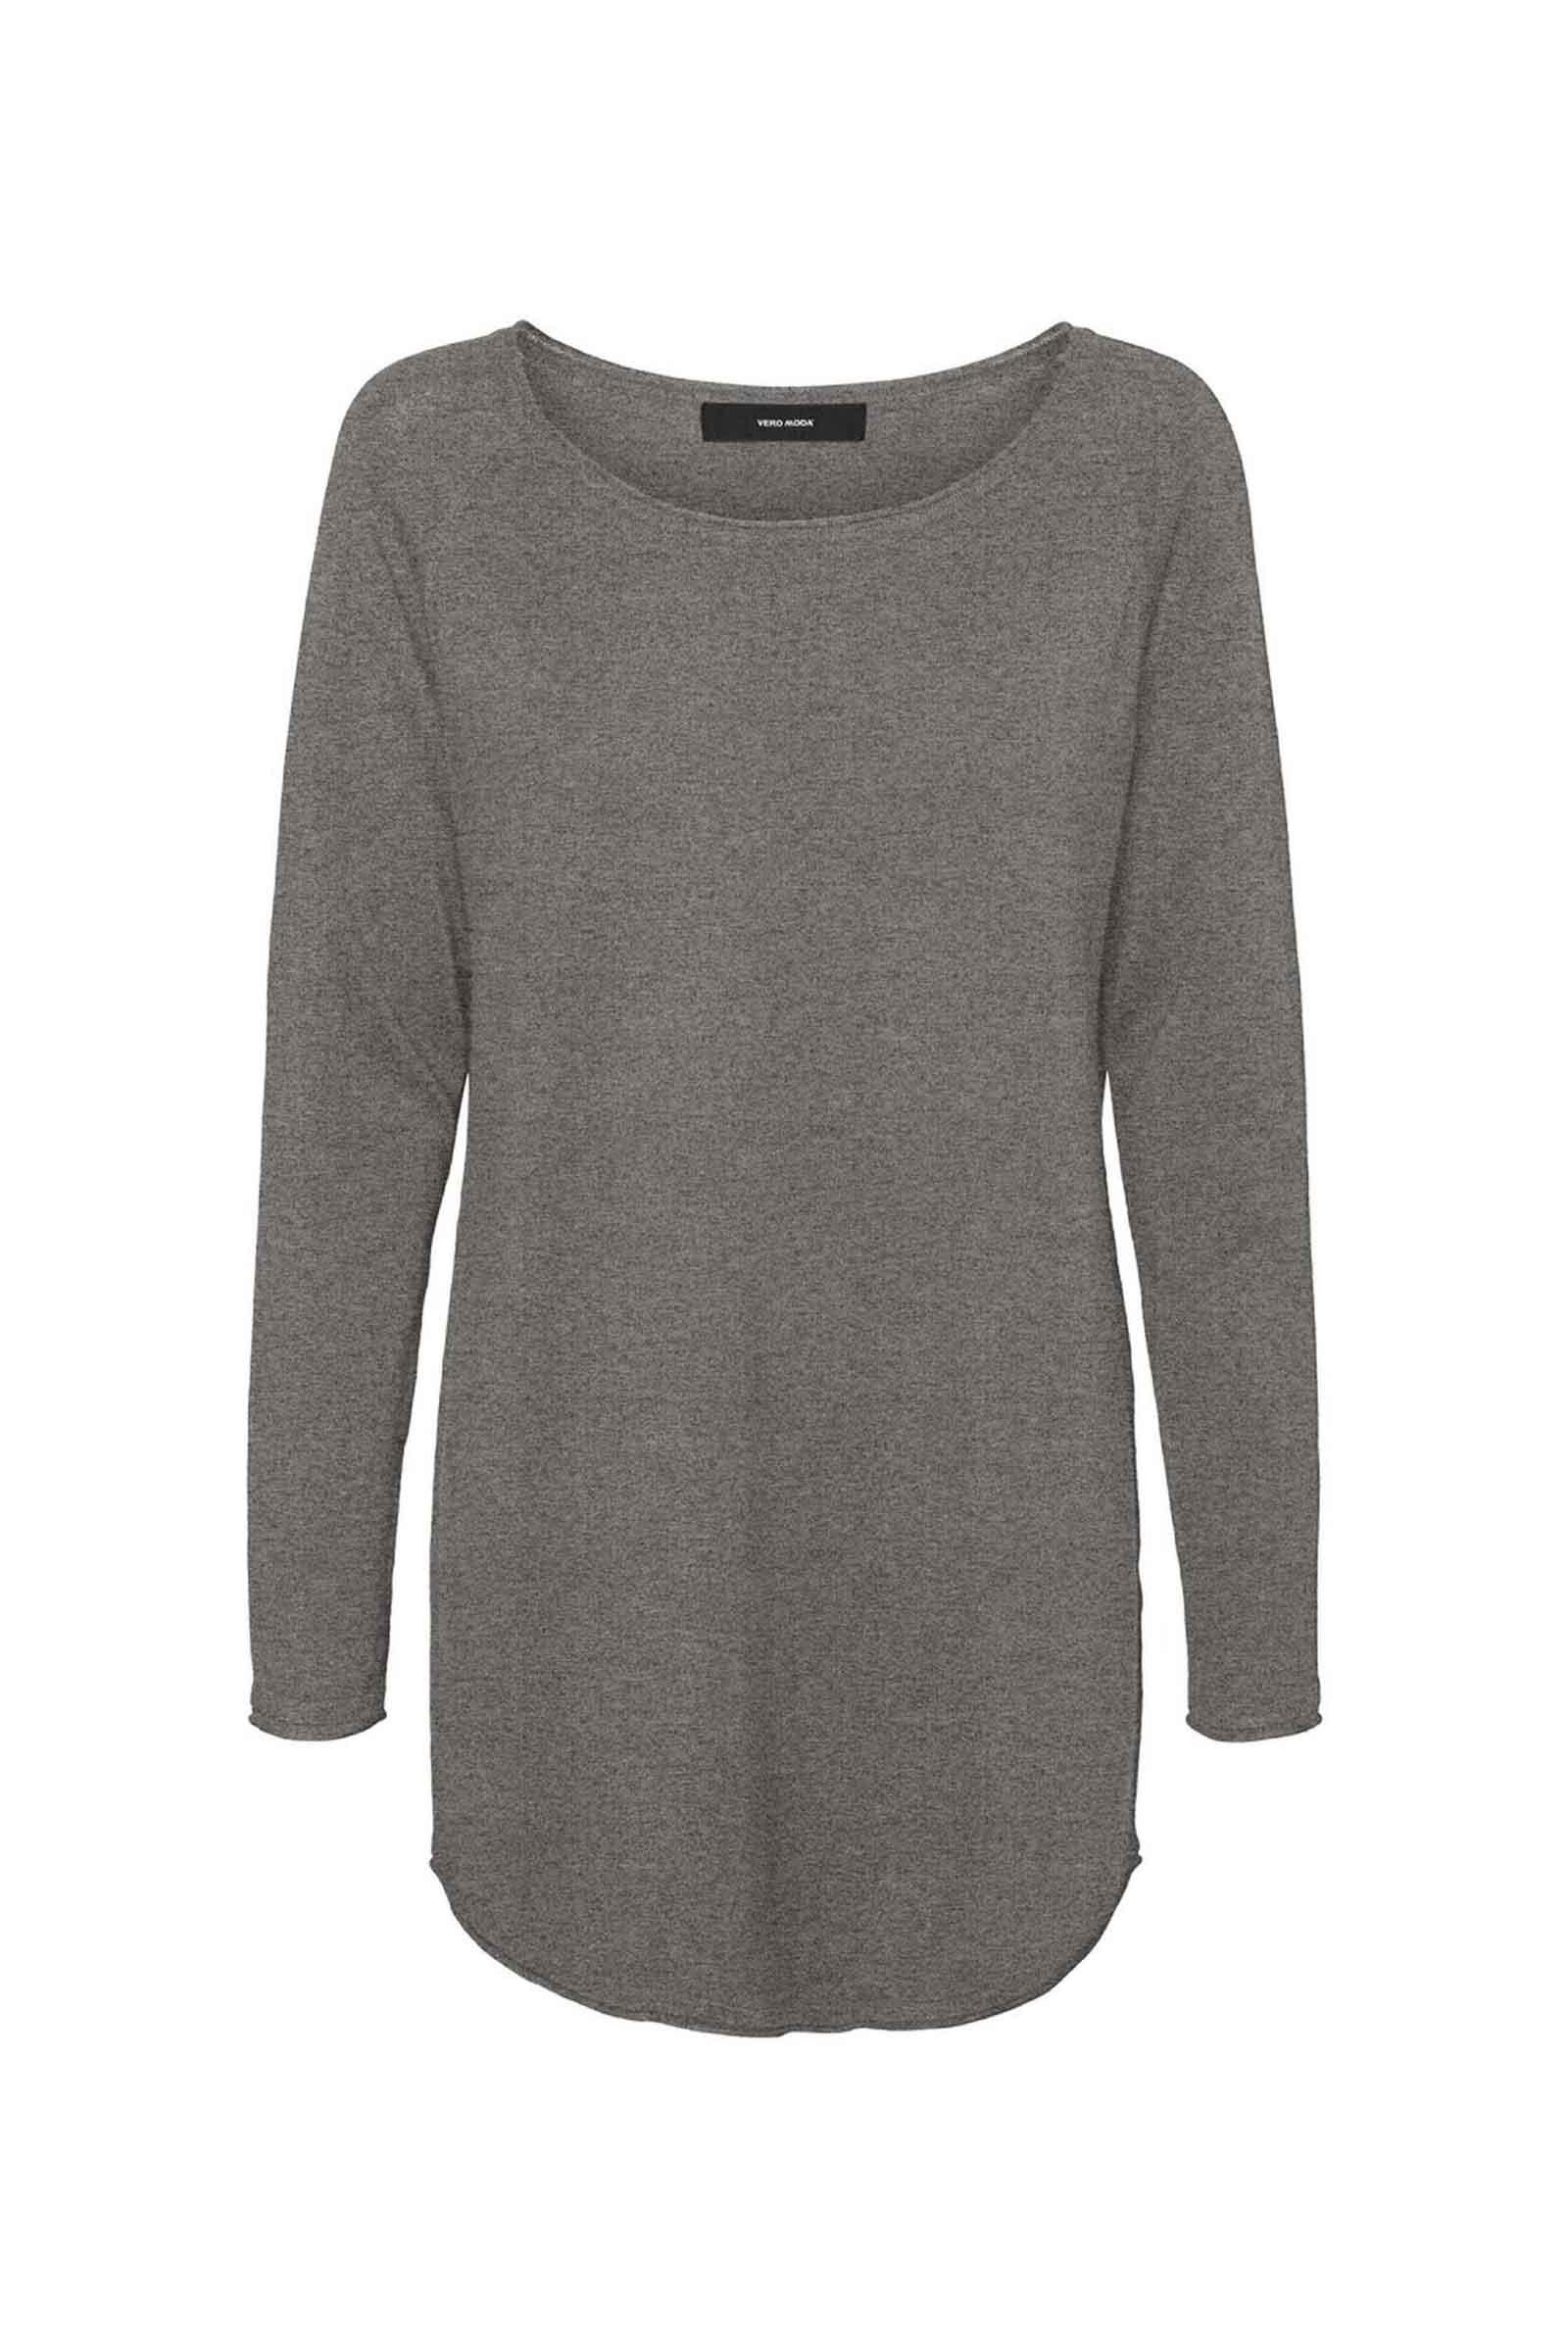 Women's Medium Grey Melange Sweater VERO MODA | Mesh | 10220902Medium Grey Melange